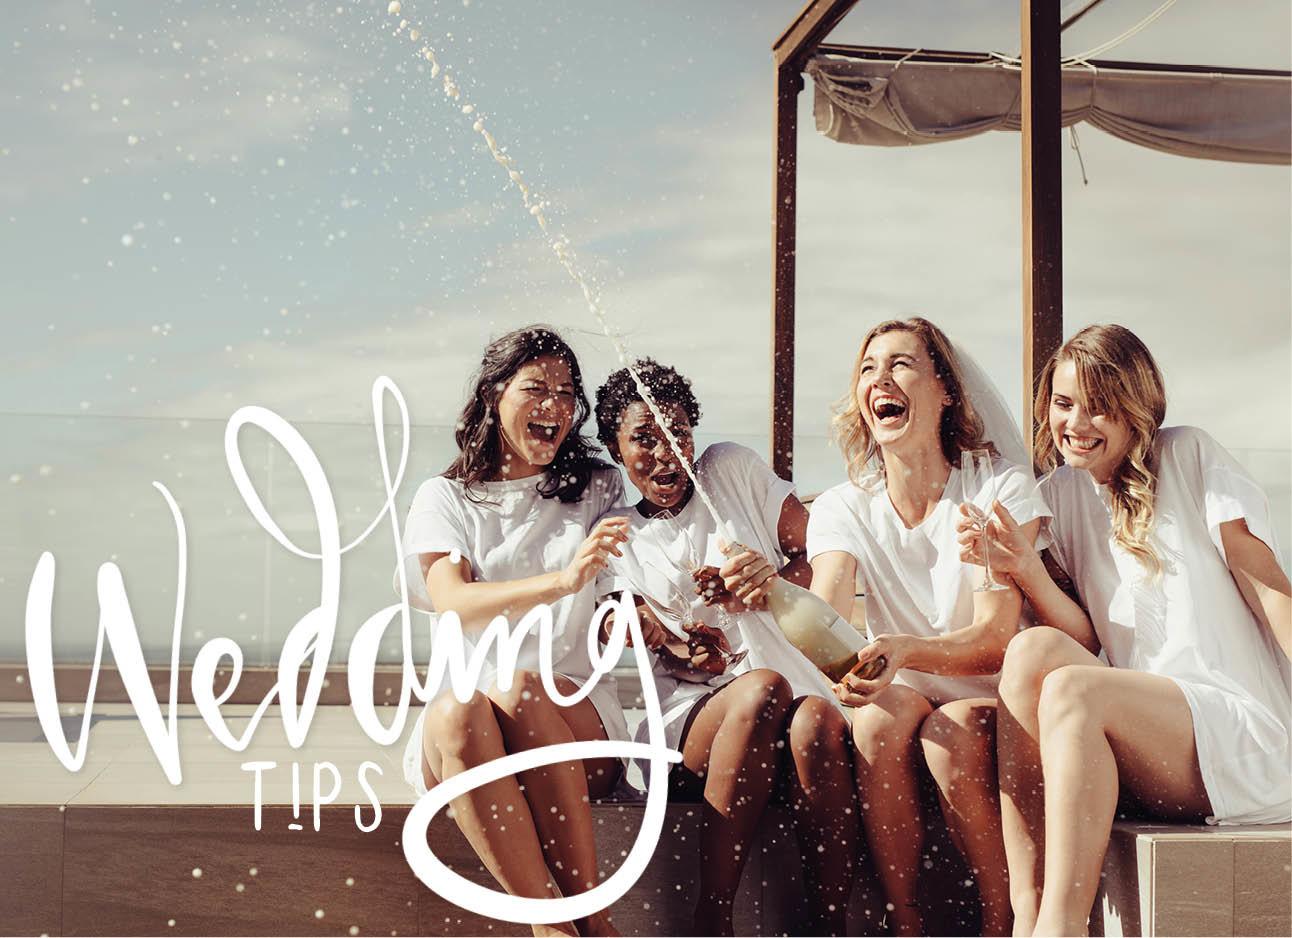 vrouwen lachend met elkaar champagne spuiten en drinken feest